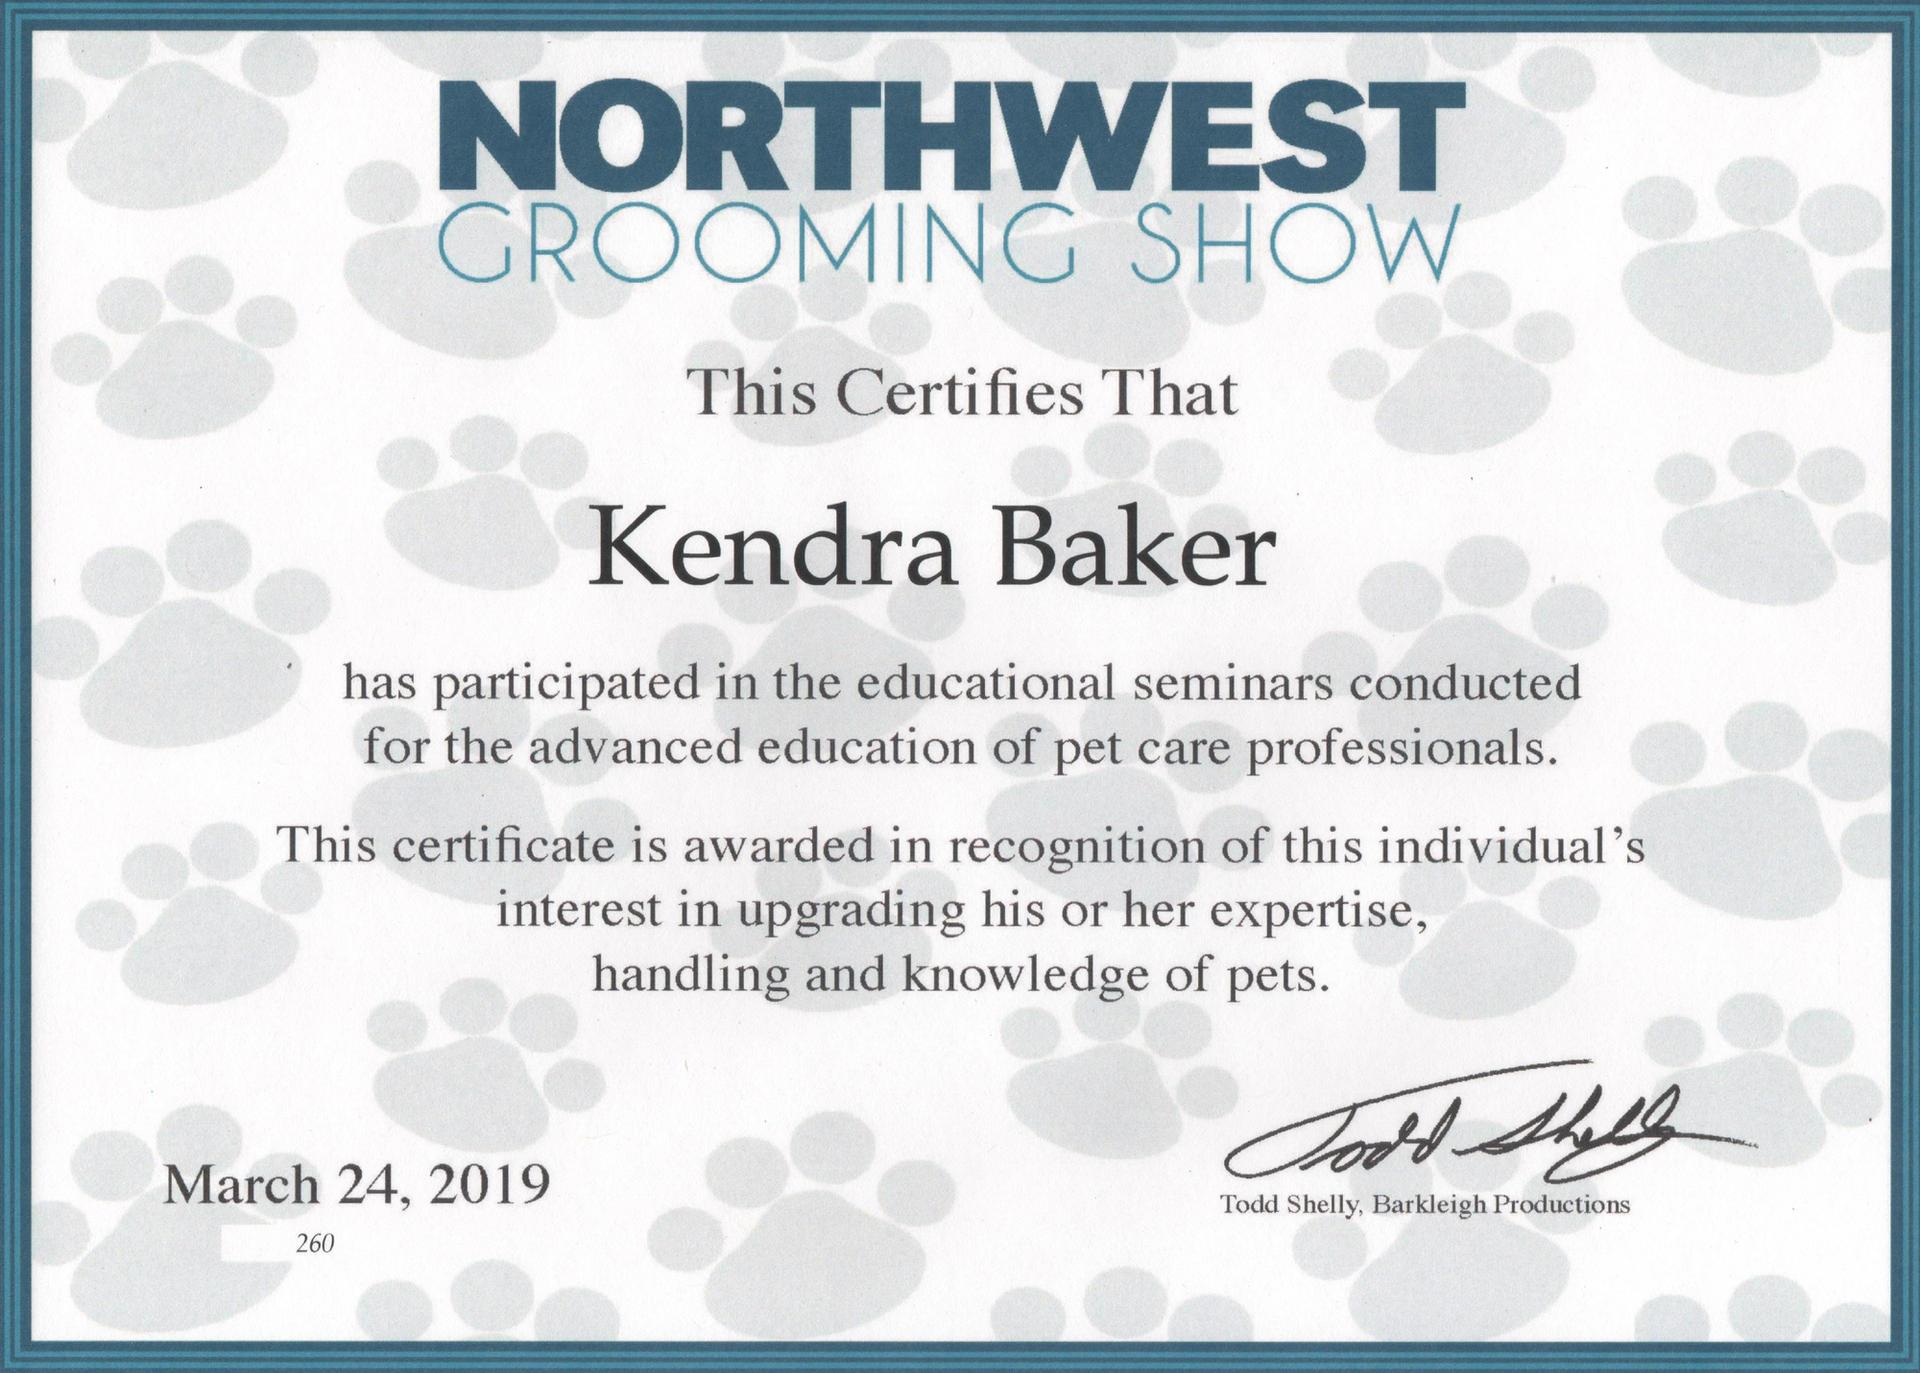 Northwest Grooming Show 2019